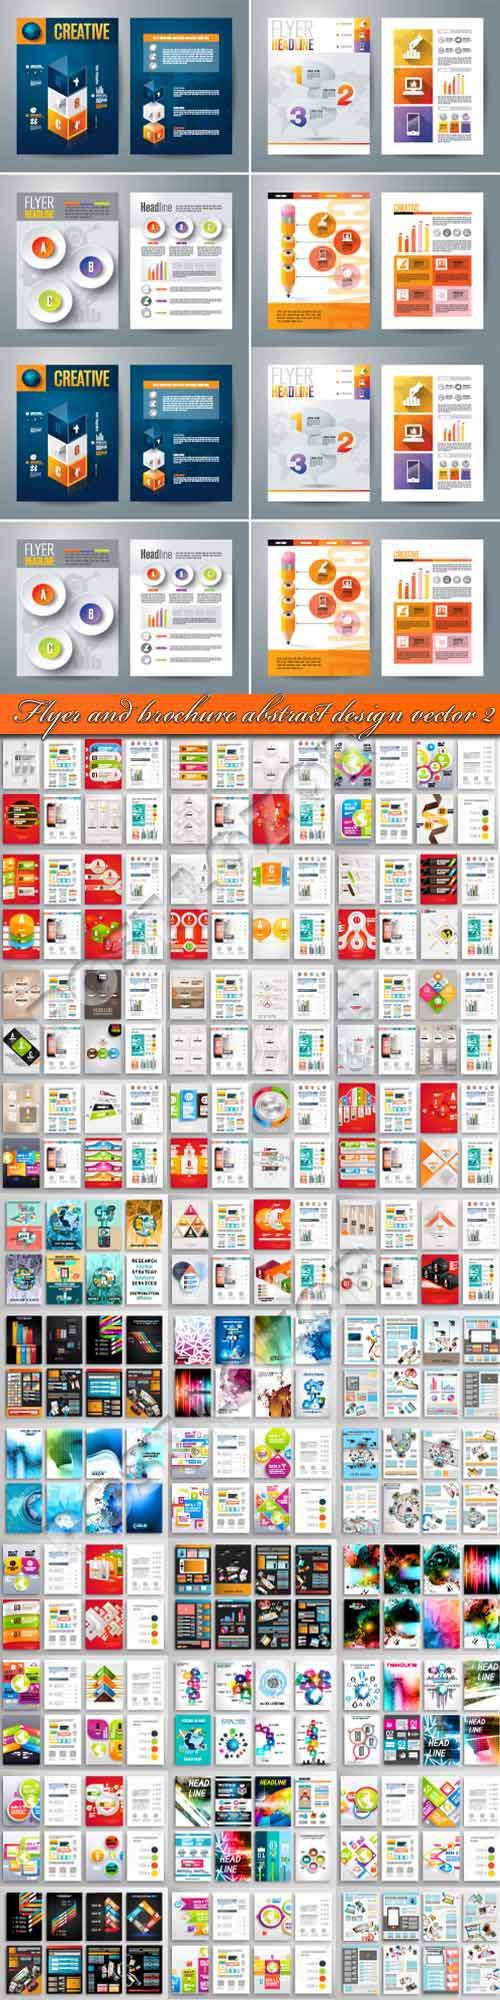 Флаер и брошюра абстрактный дизайн 2 | Flyer and brochure abstract design vector 2